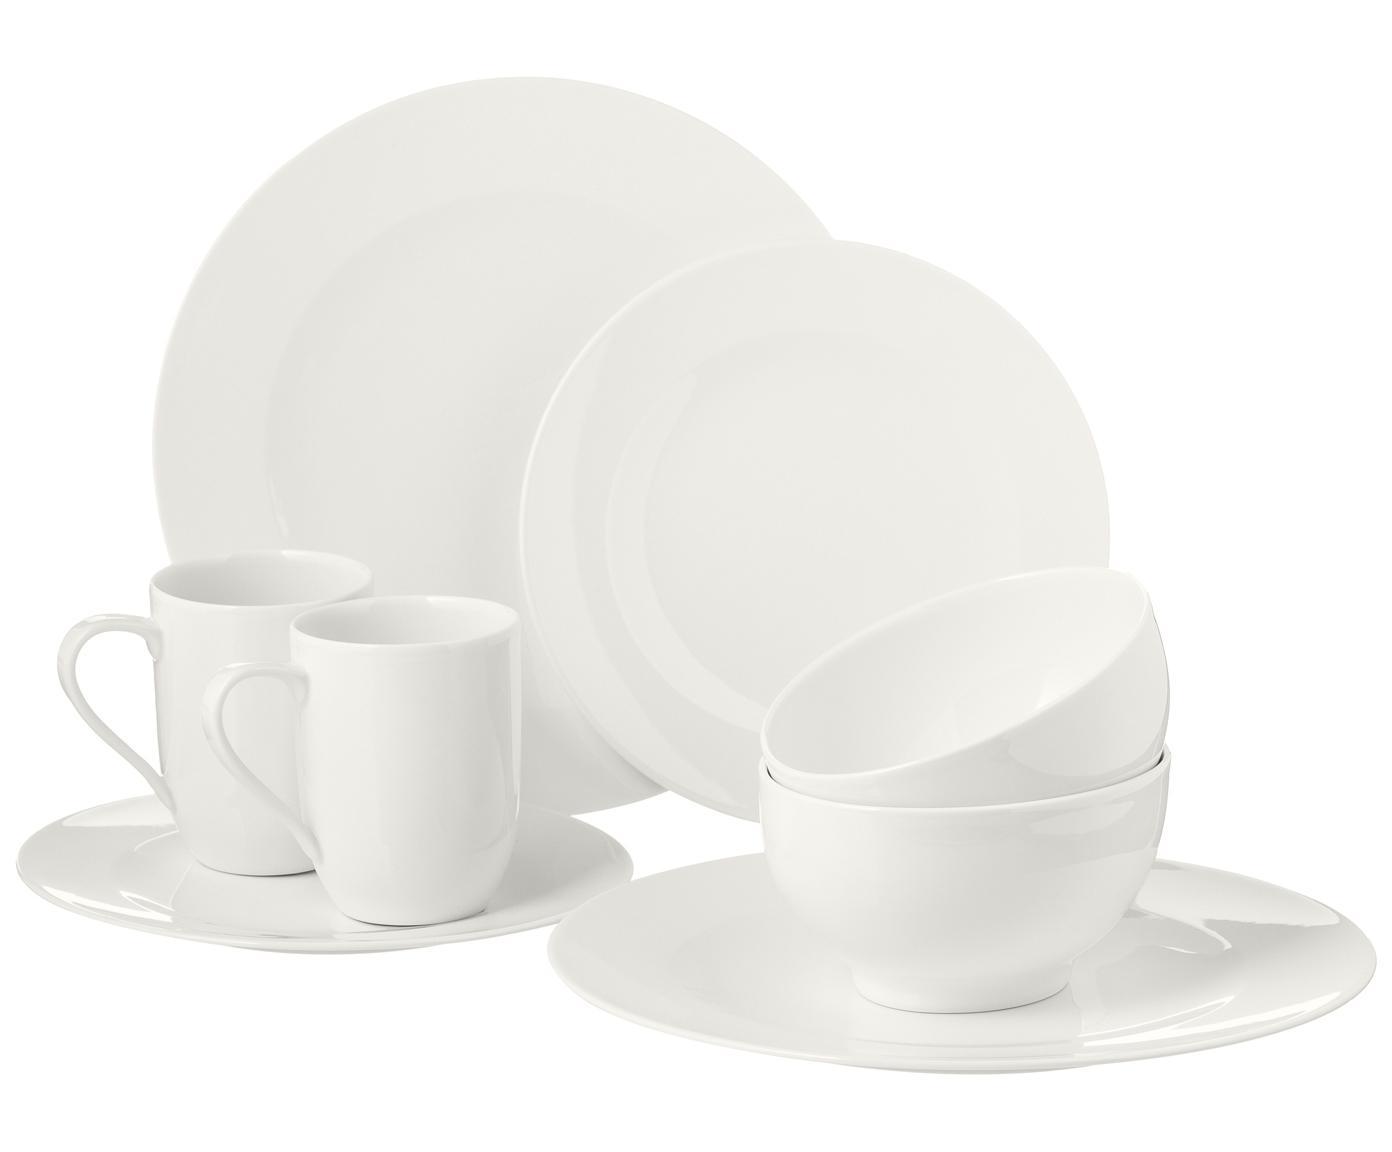 Set di stoviglie in porcellana For Me 16 pz, Porcellana, Bianco latteo, Diverse dimensioni